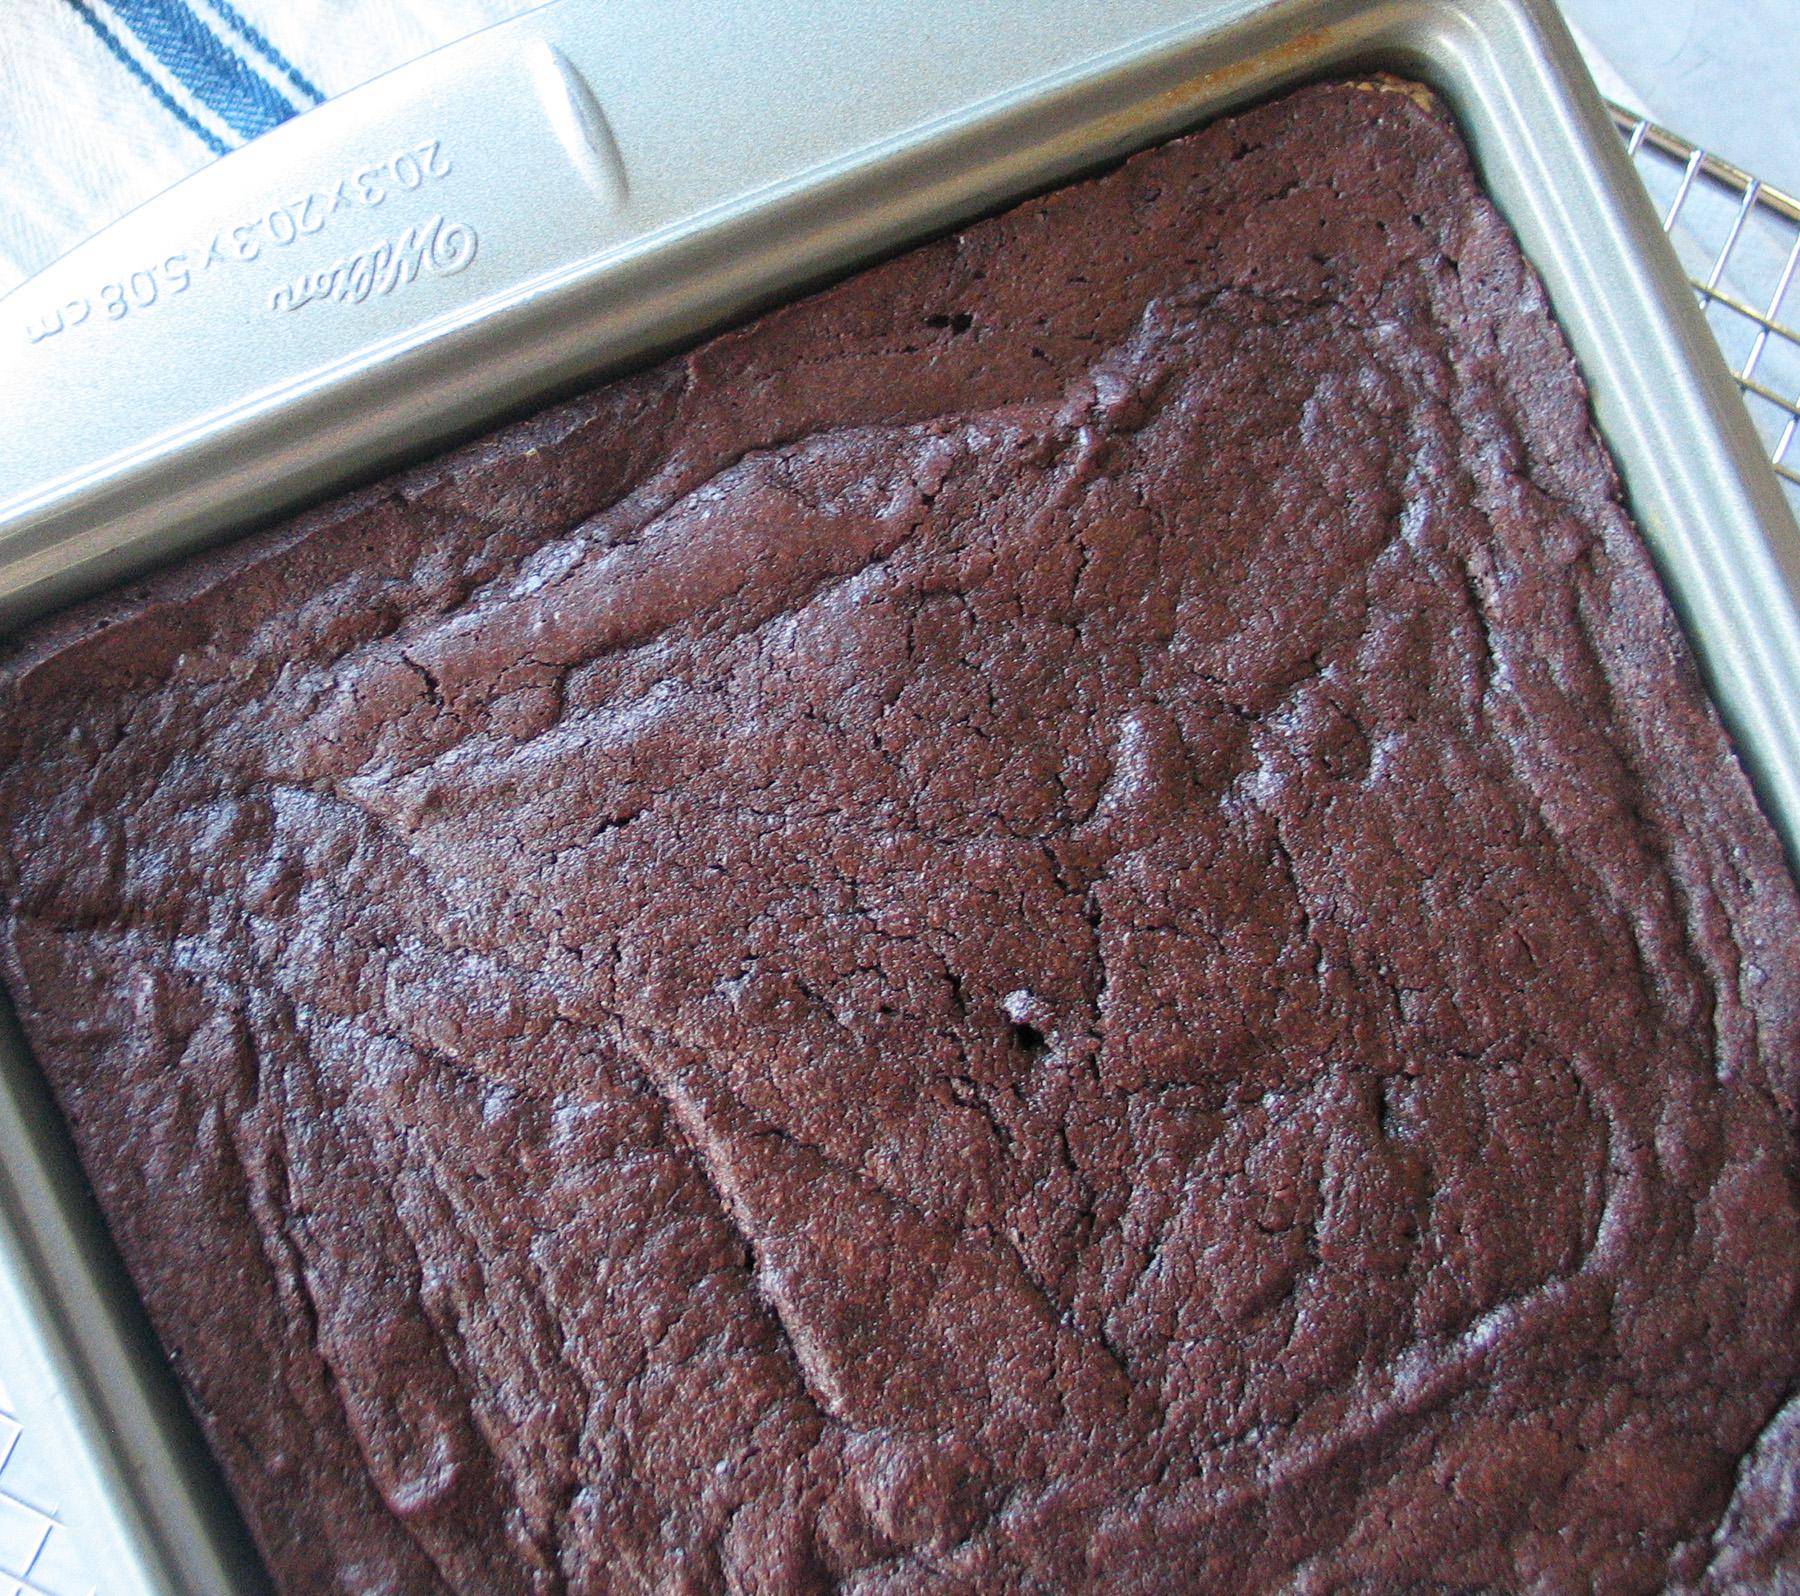 Alton's Cocoa Brownies